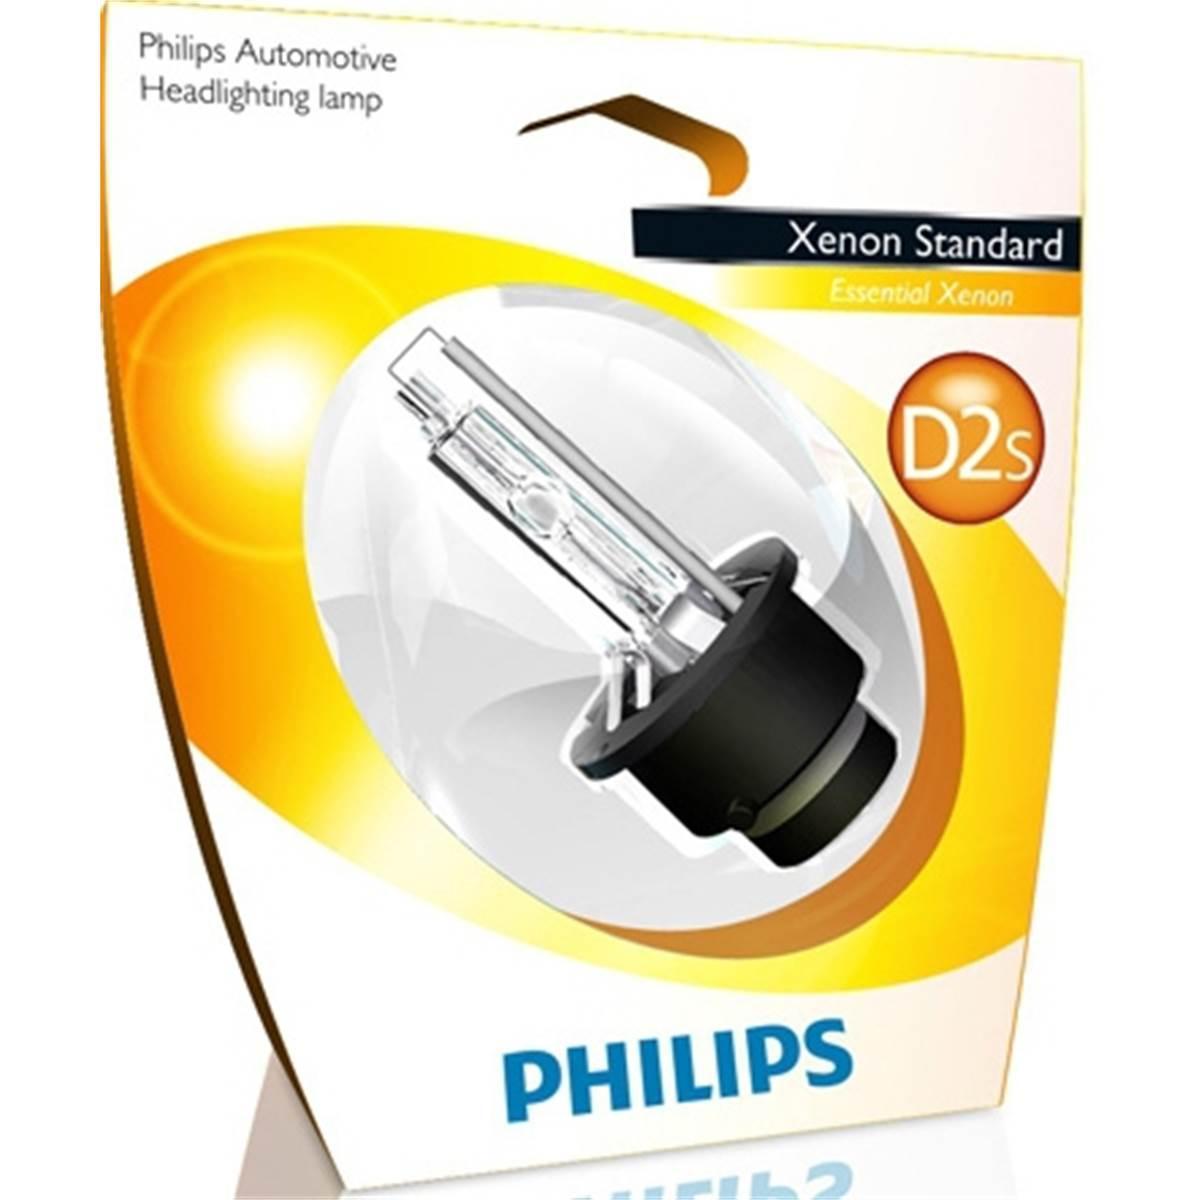 eclairage ampoule 35w. Black Bedroom Furniture Sets. Home Design Ideas